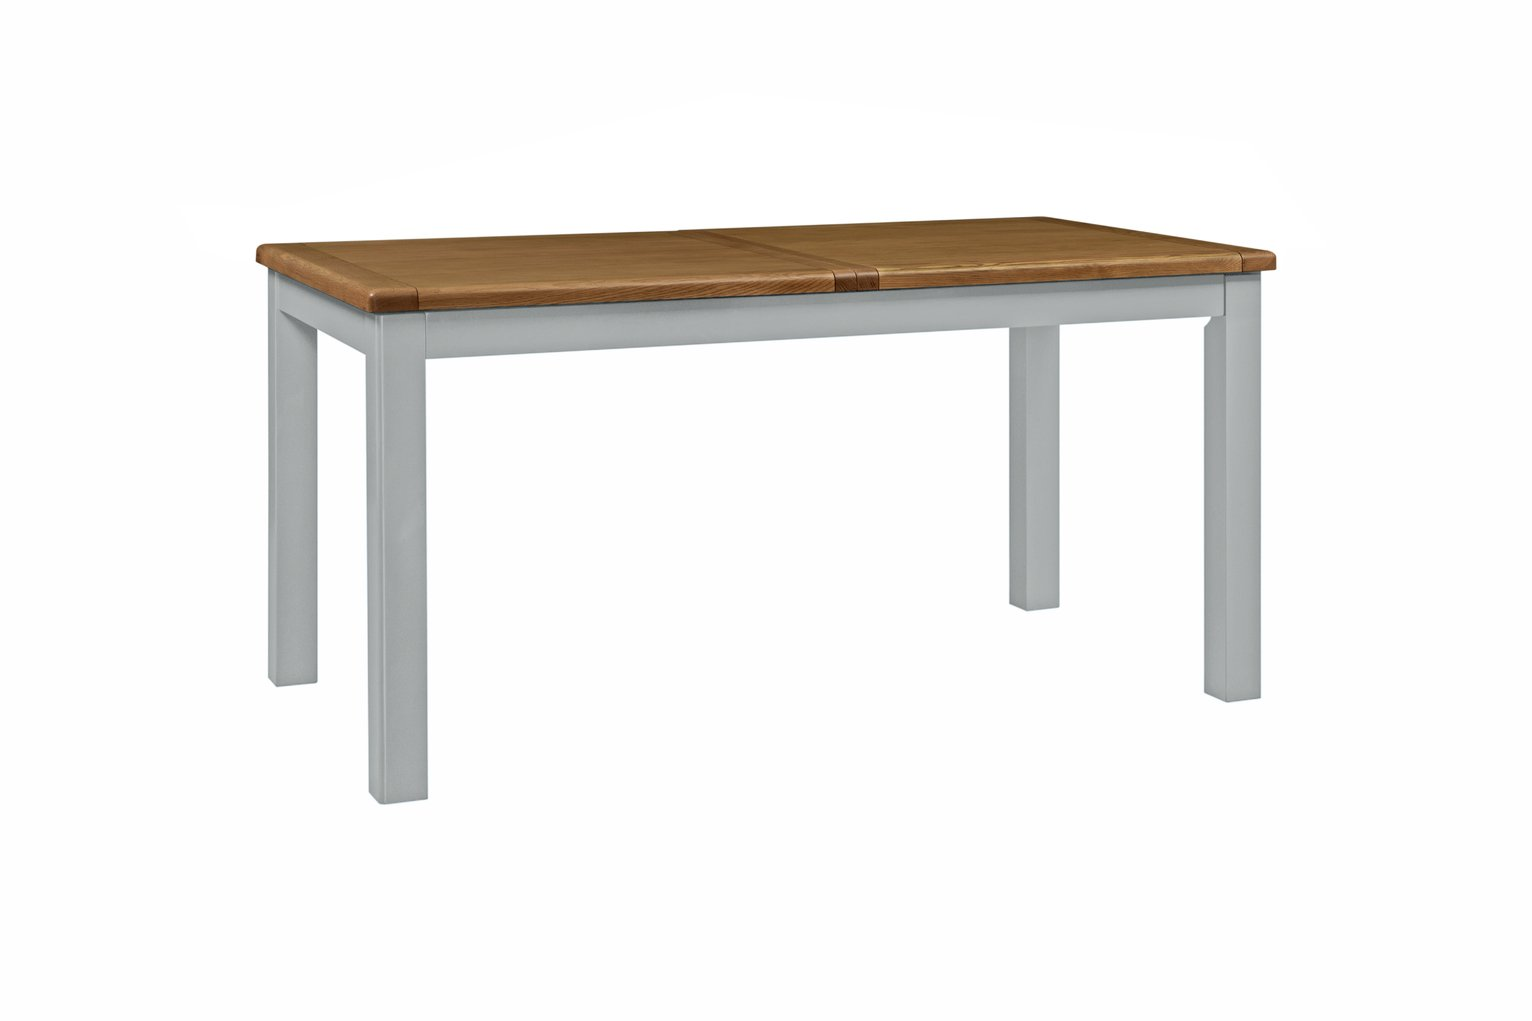 Habitat Kent Extending 6-8 Seater Dining Table - Light Grey